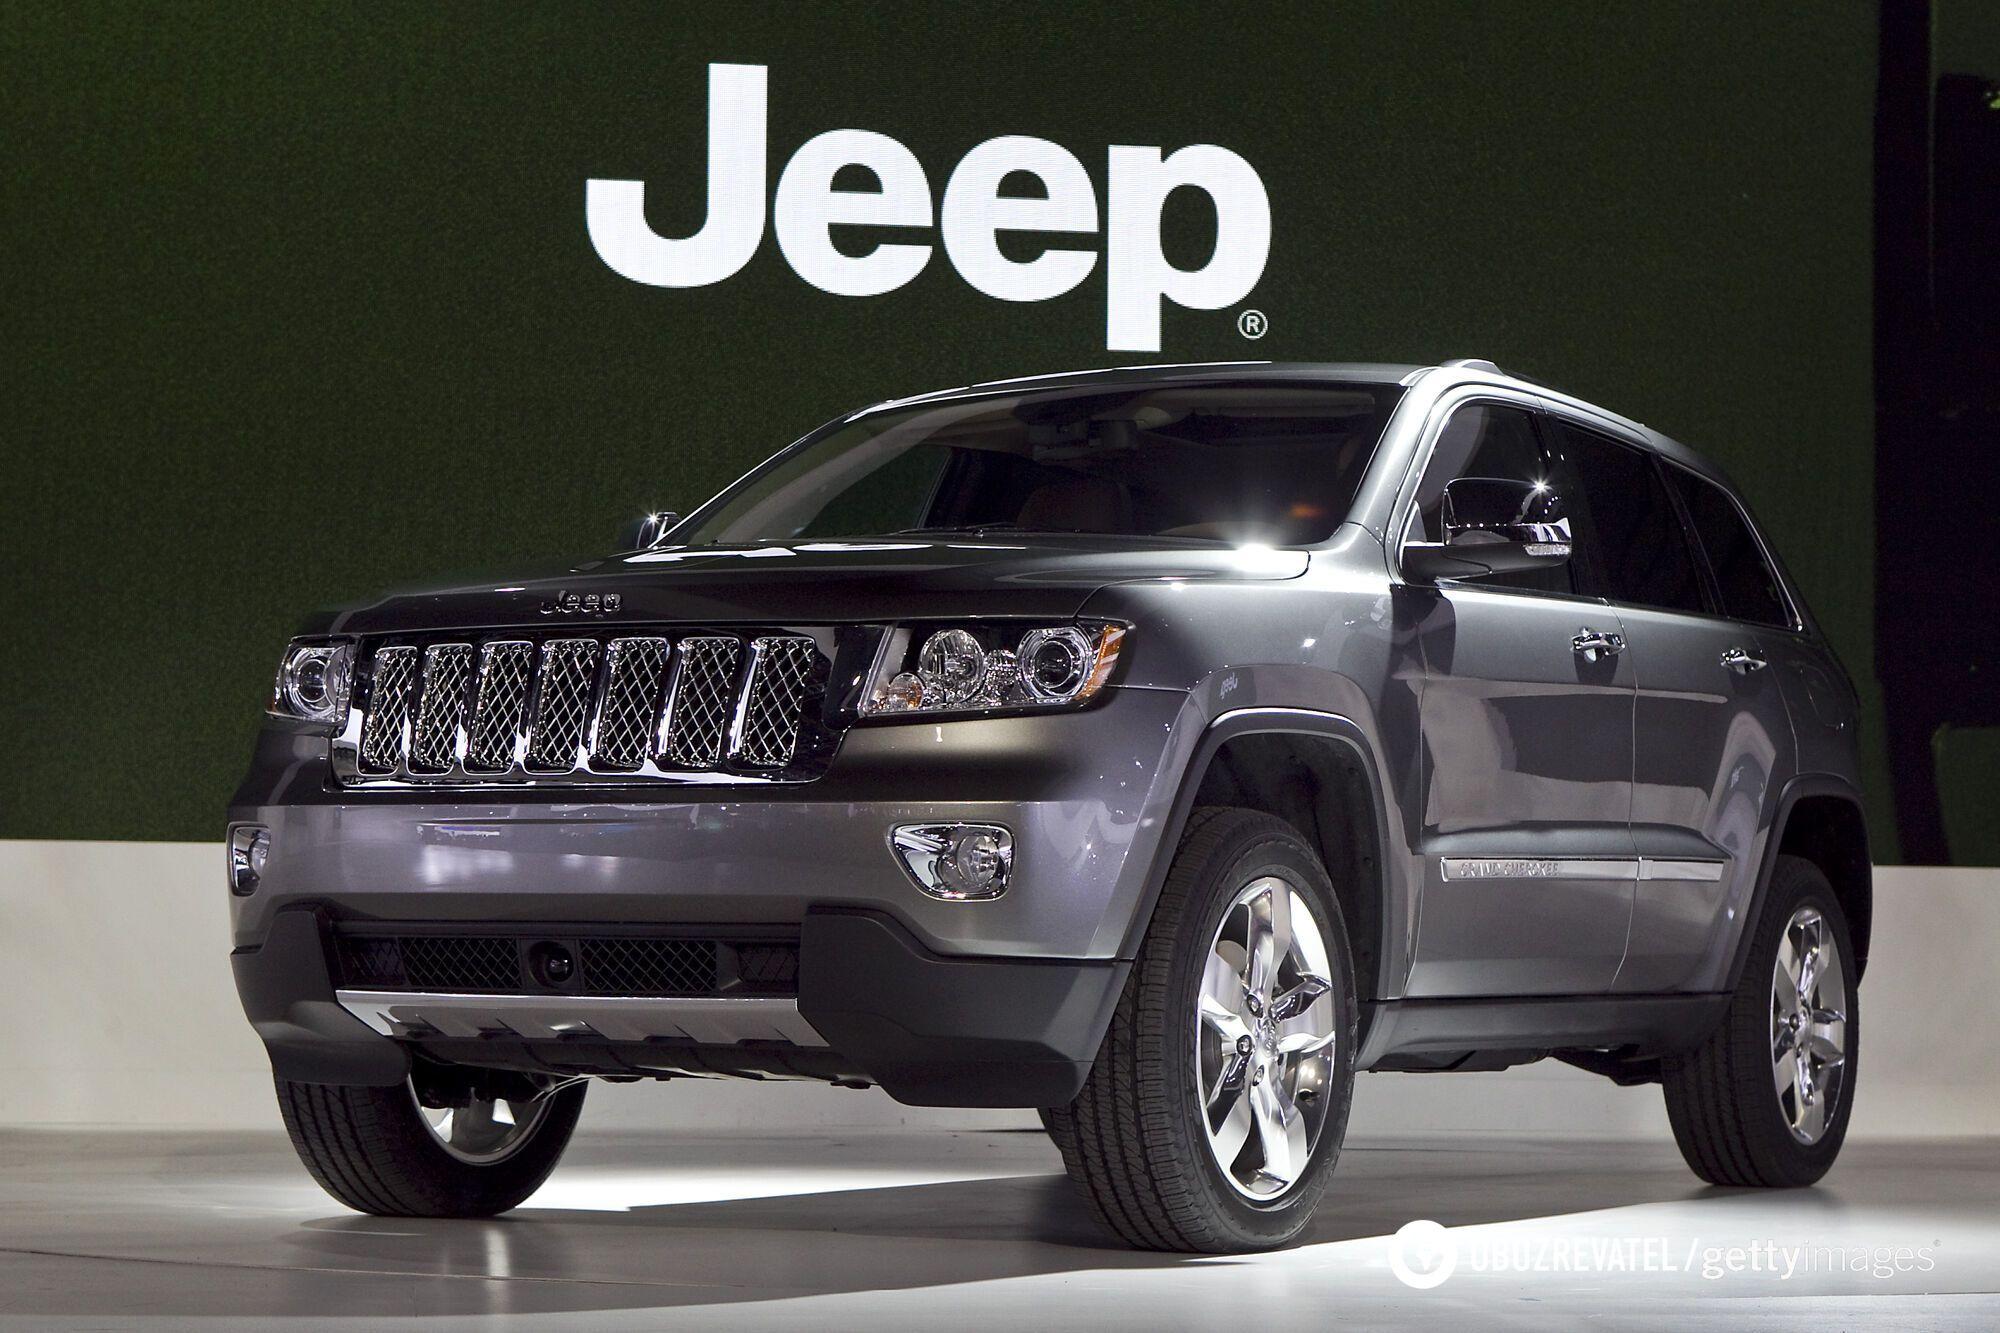 Jeep Grand Cherokee 2011 випуску